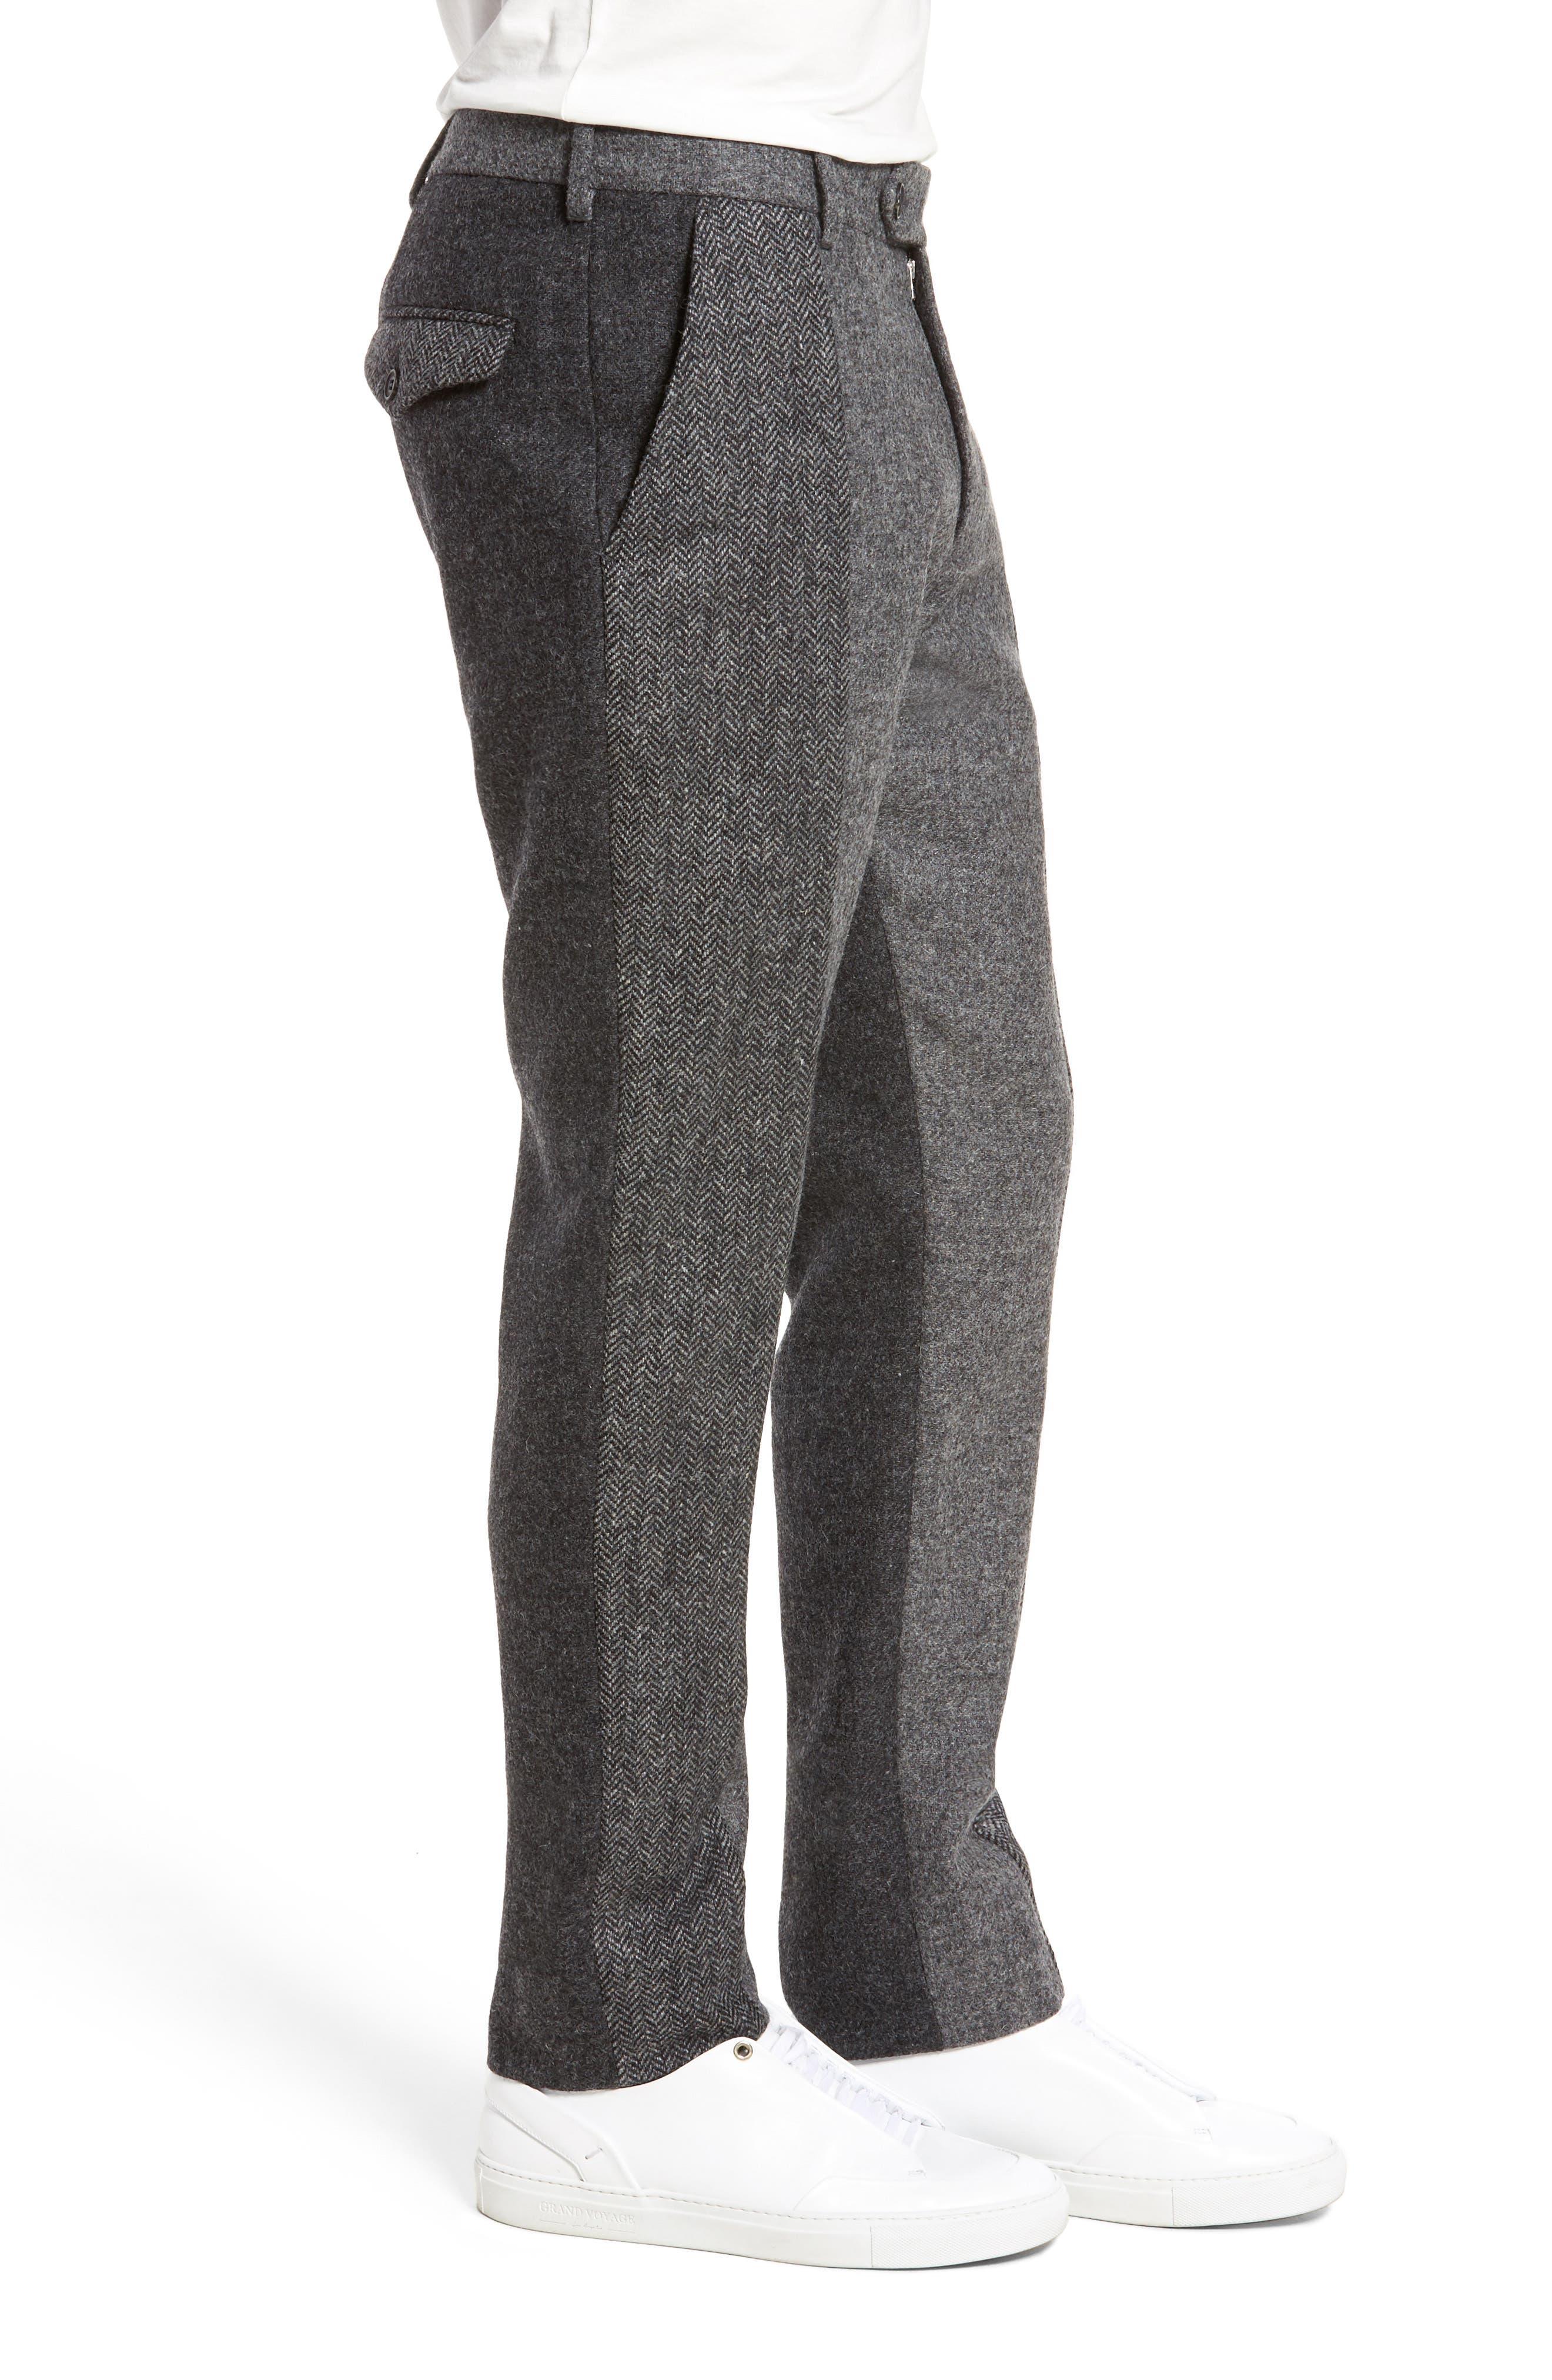 Patchwork Wool Trousers,                             Alternate thumbnail 3, color,                             Grey Melange